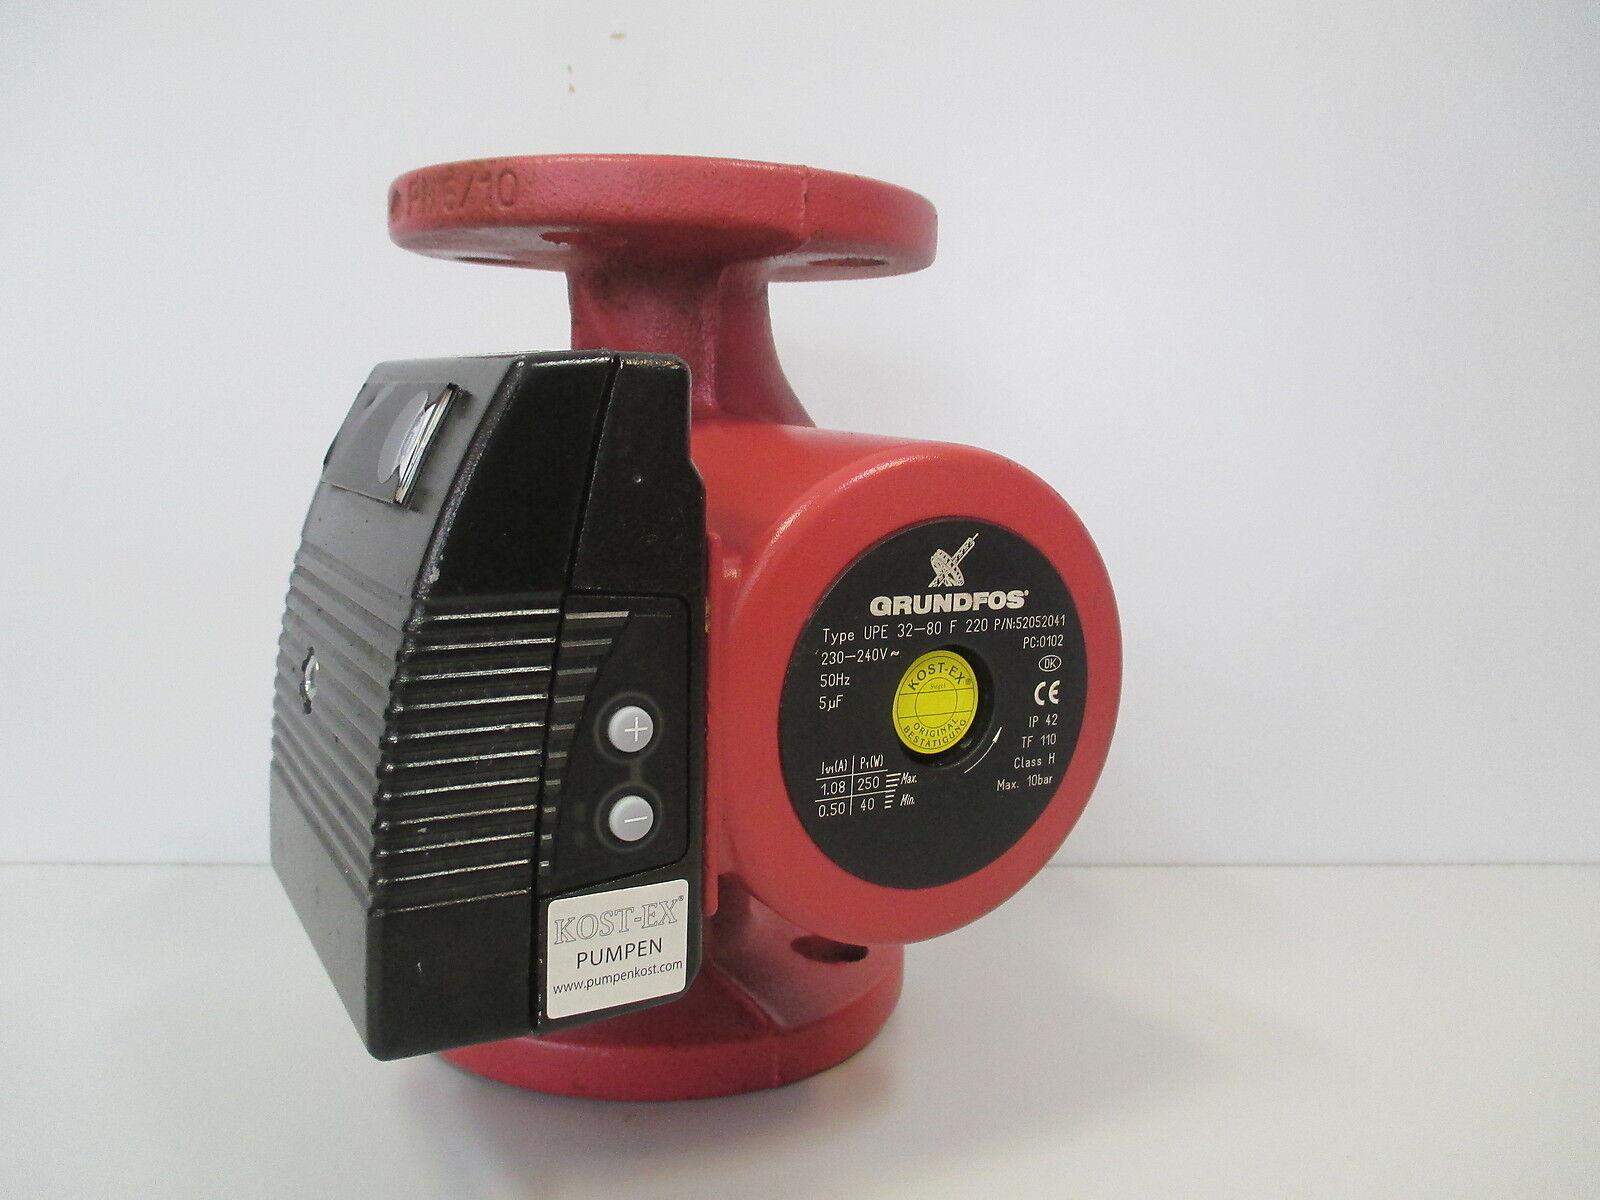 Pumpe Grundfos UPE 32 - 80 F 220 Heizungspumpe 1 x 230 V Pumpenkost P15 418